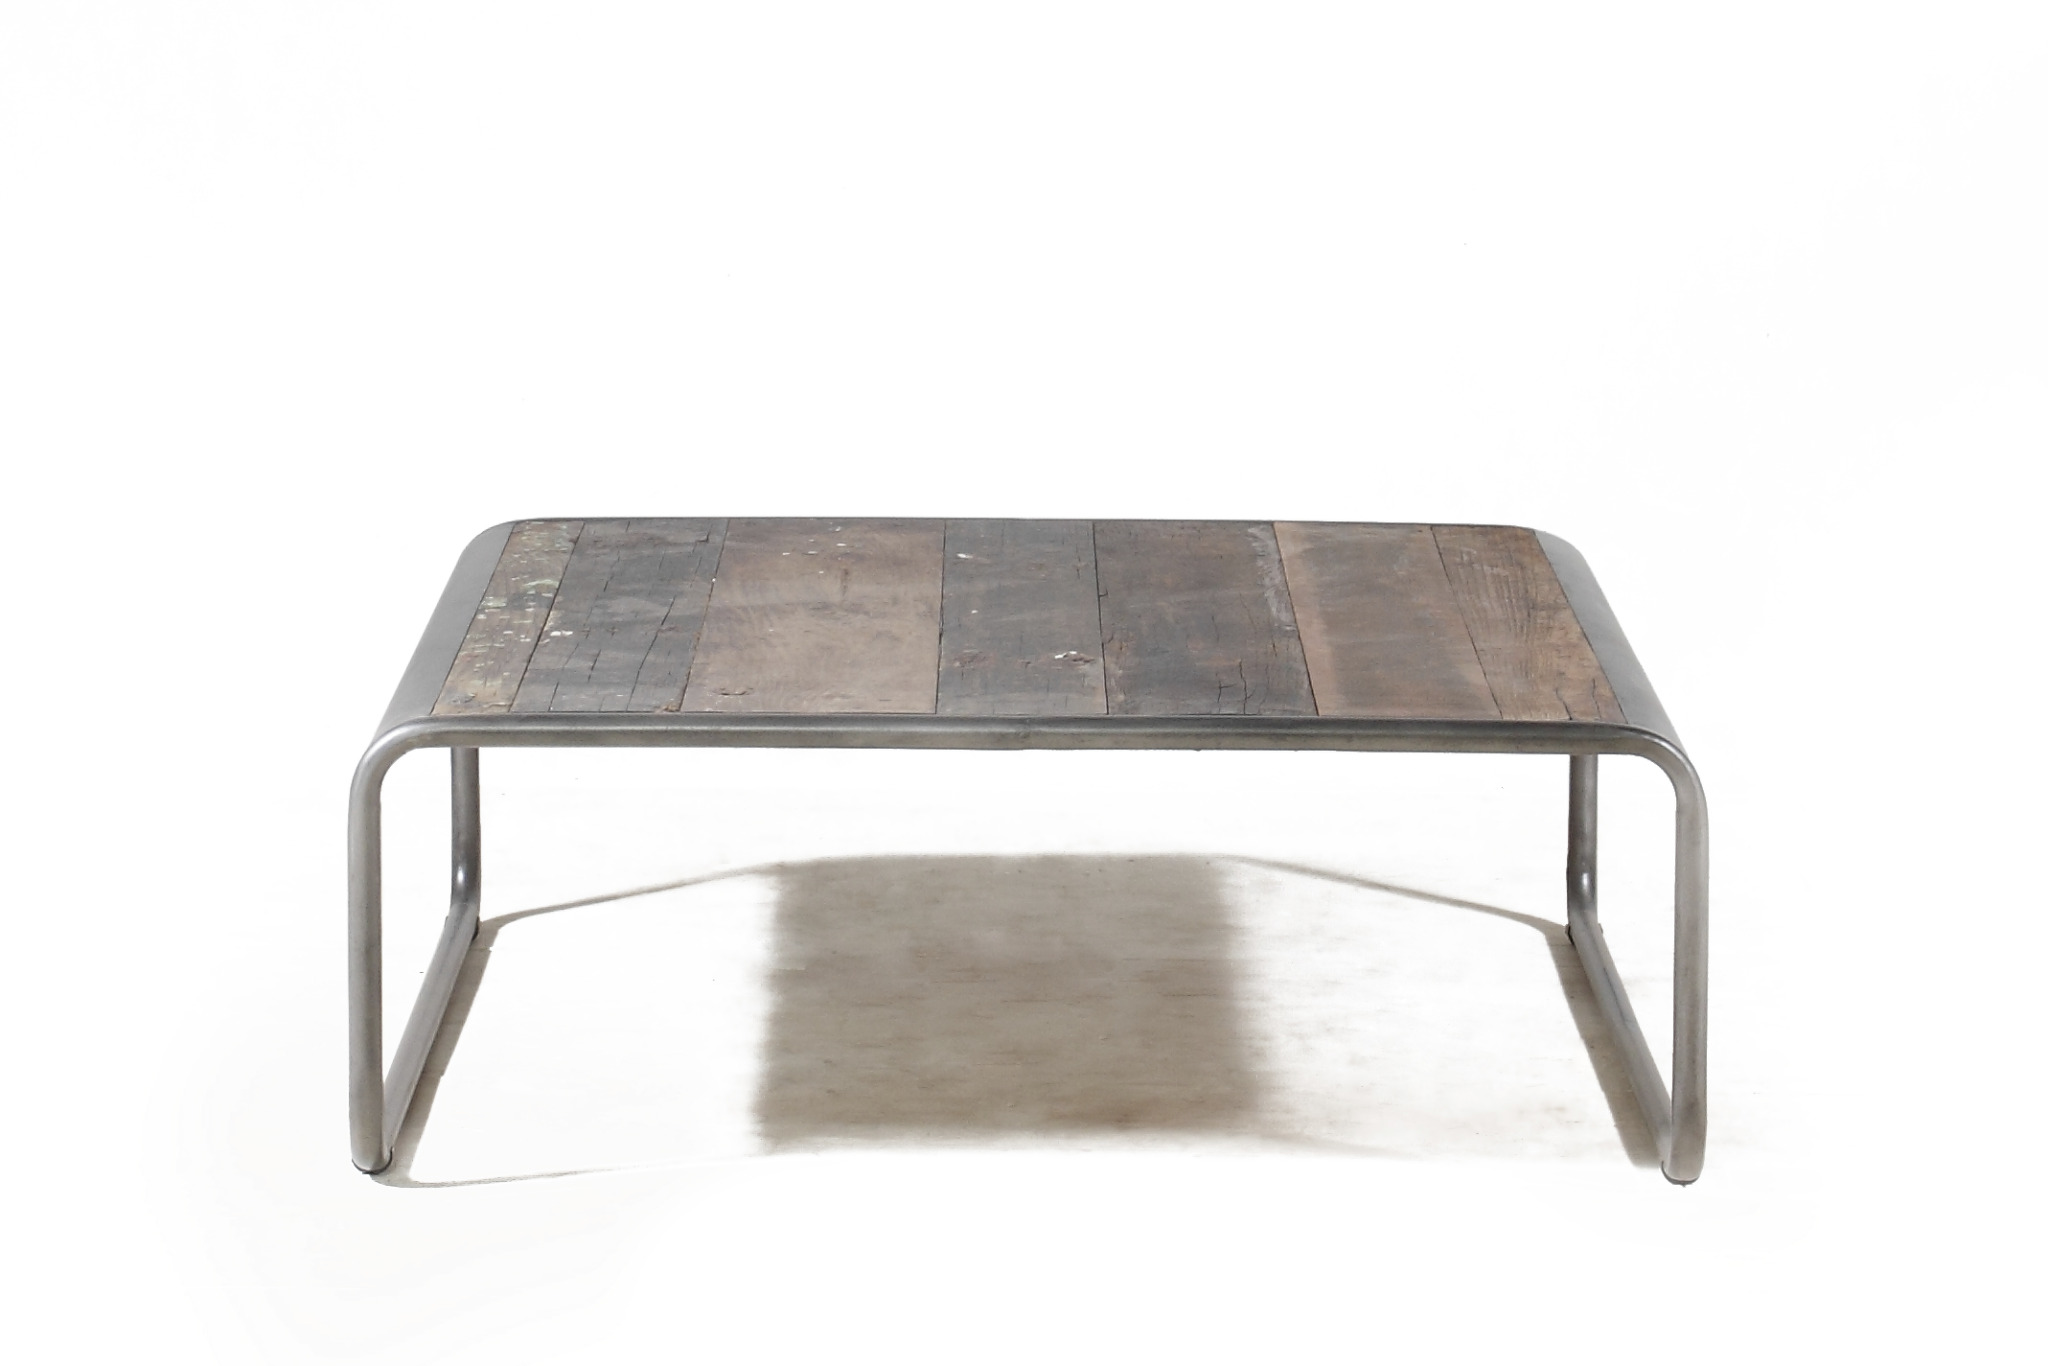 Calabar Urban Reclaimed Wood amp Cast Iron Small Coffee Table